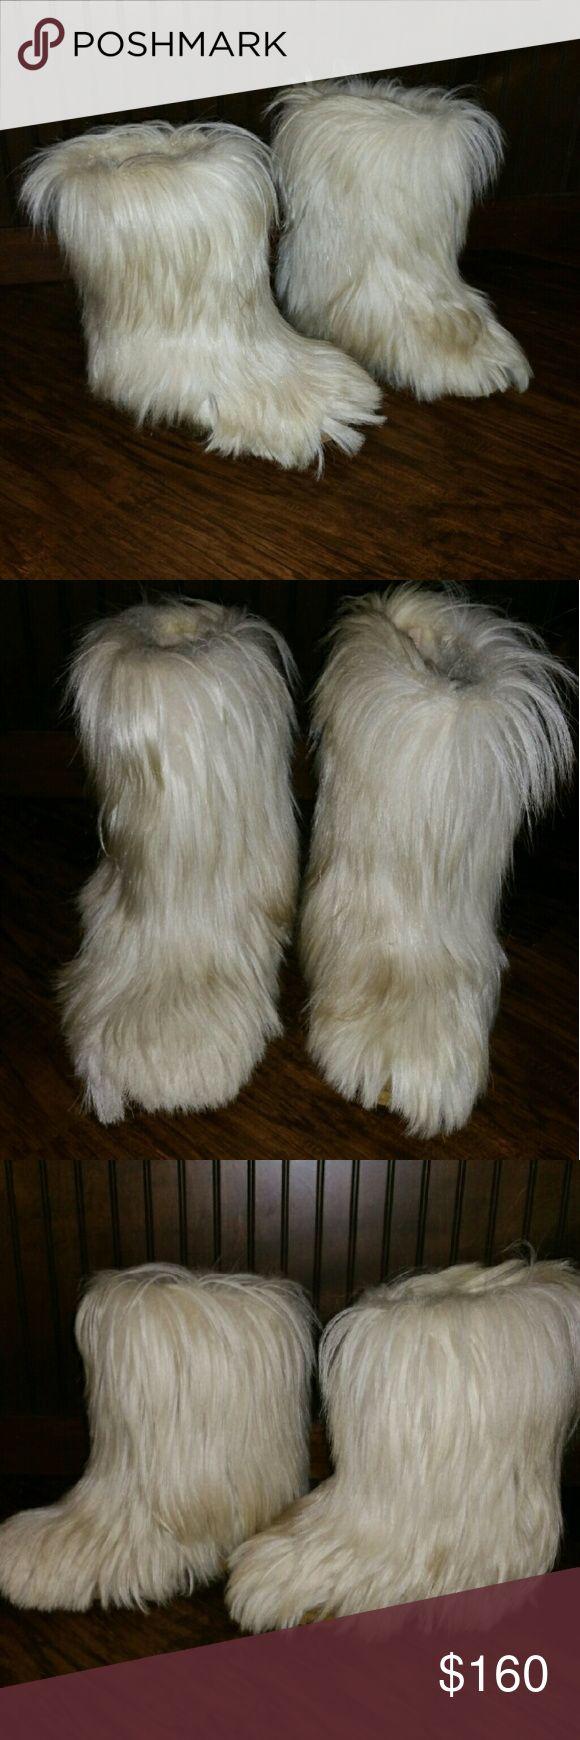 Vintage Yetti Italian 70s Goat Fur After Ski Boots I